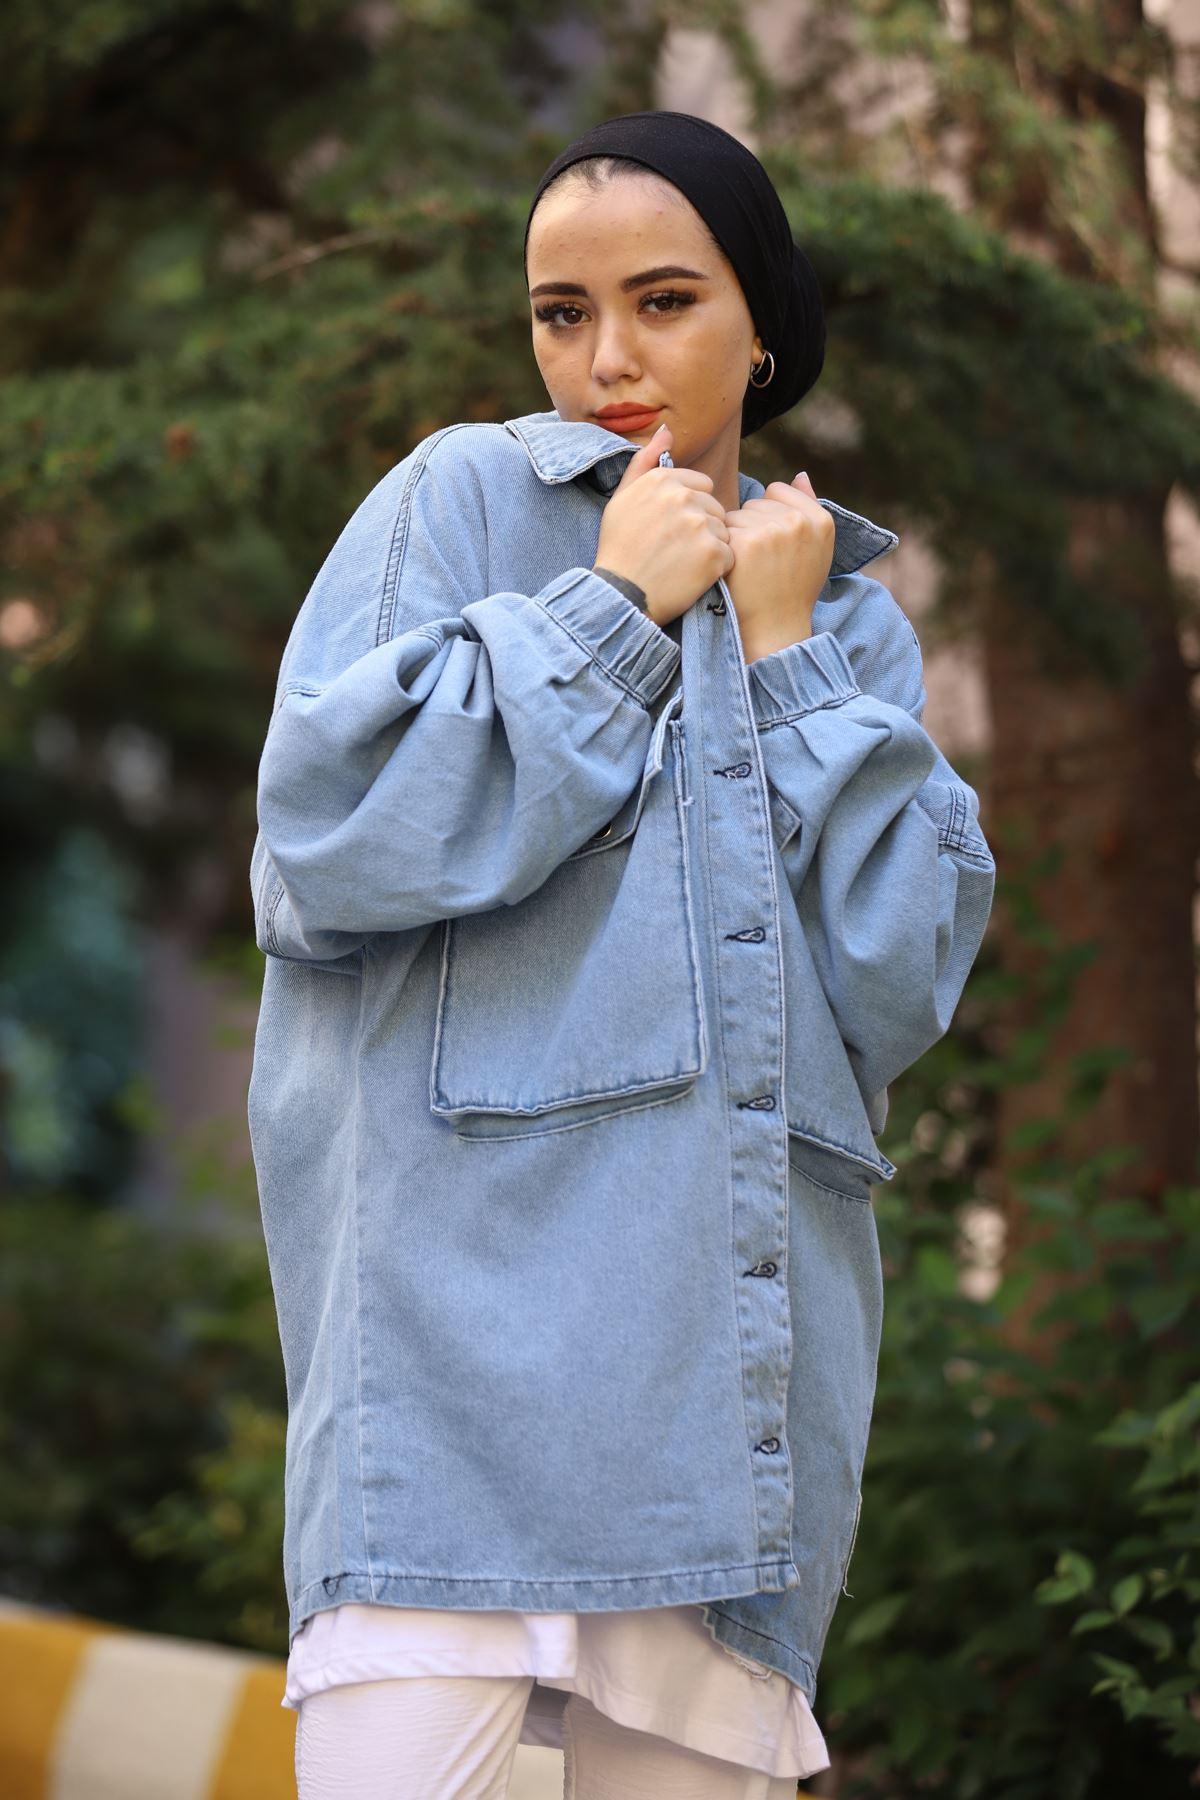 Torba Cepli Kot Ceket - Açık Mavi